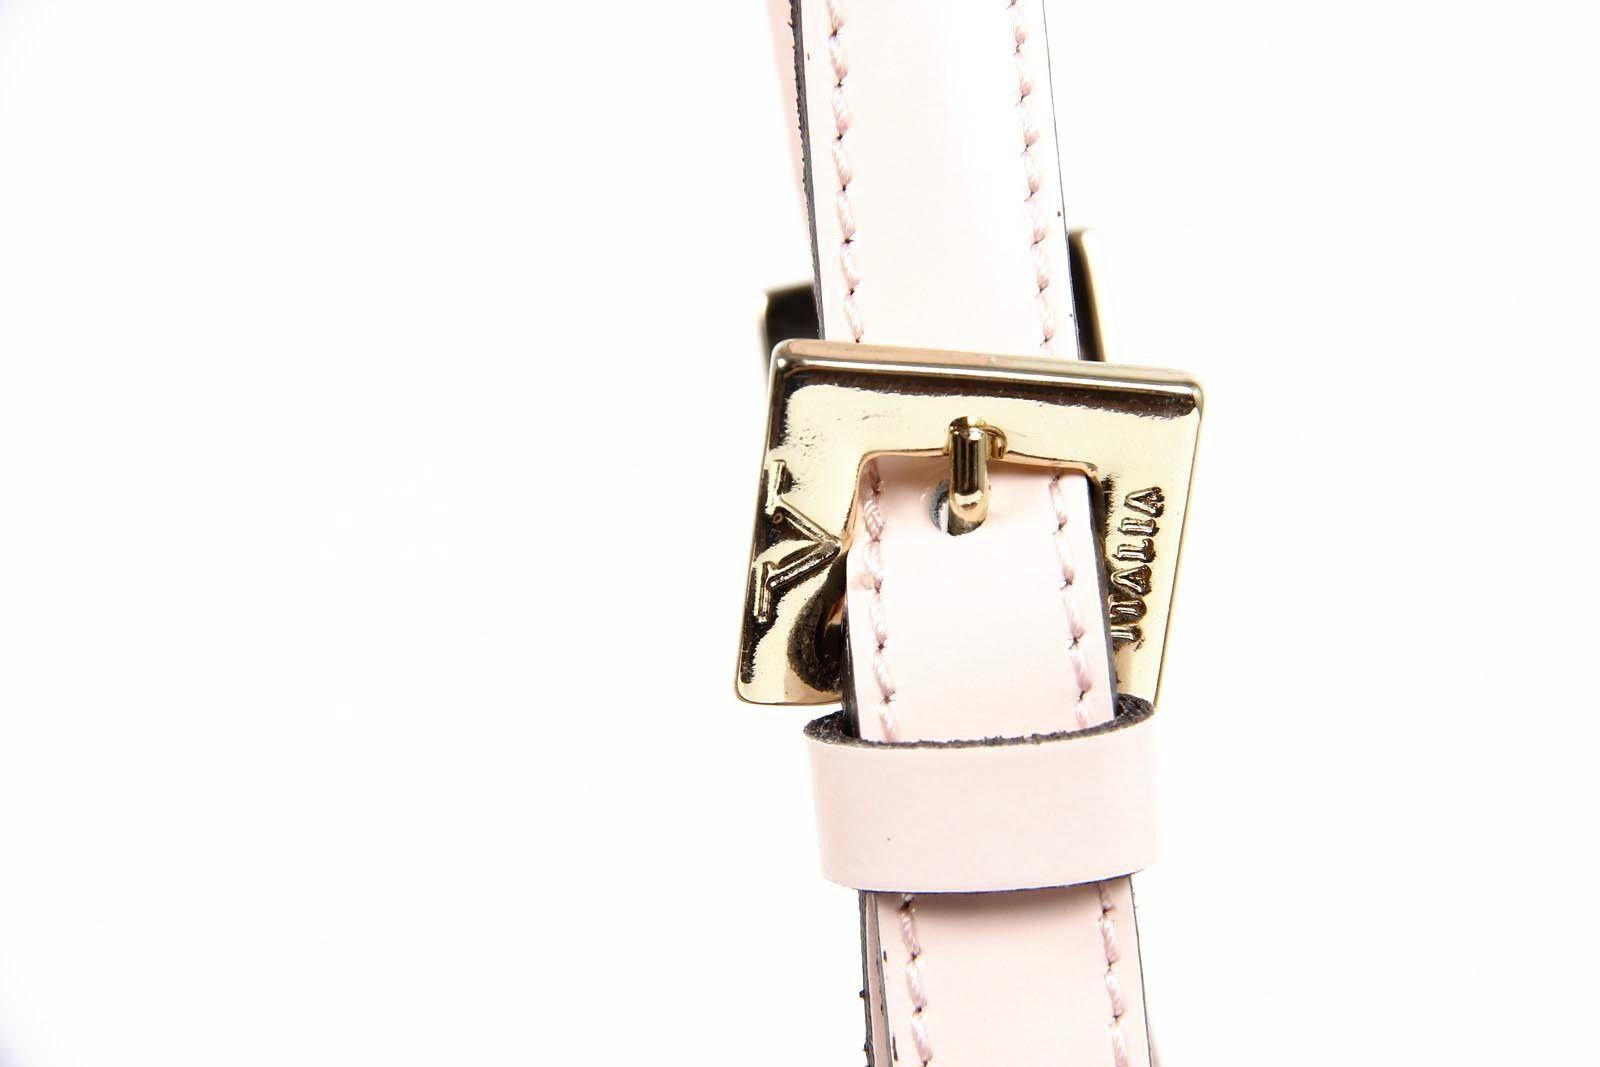 Versace 19.69 Abbigliamento Sportivo Srl ladies handbag E250/52 RUGA/SPECCHIO TUBEROSE